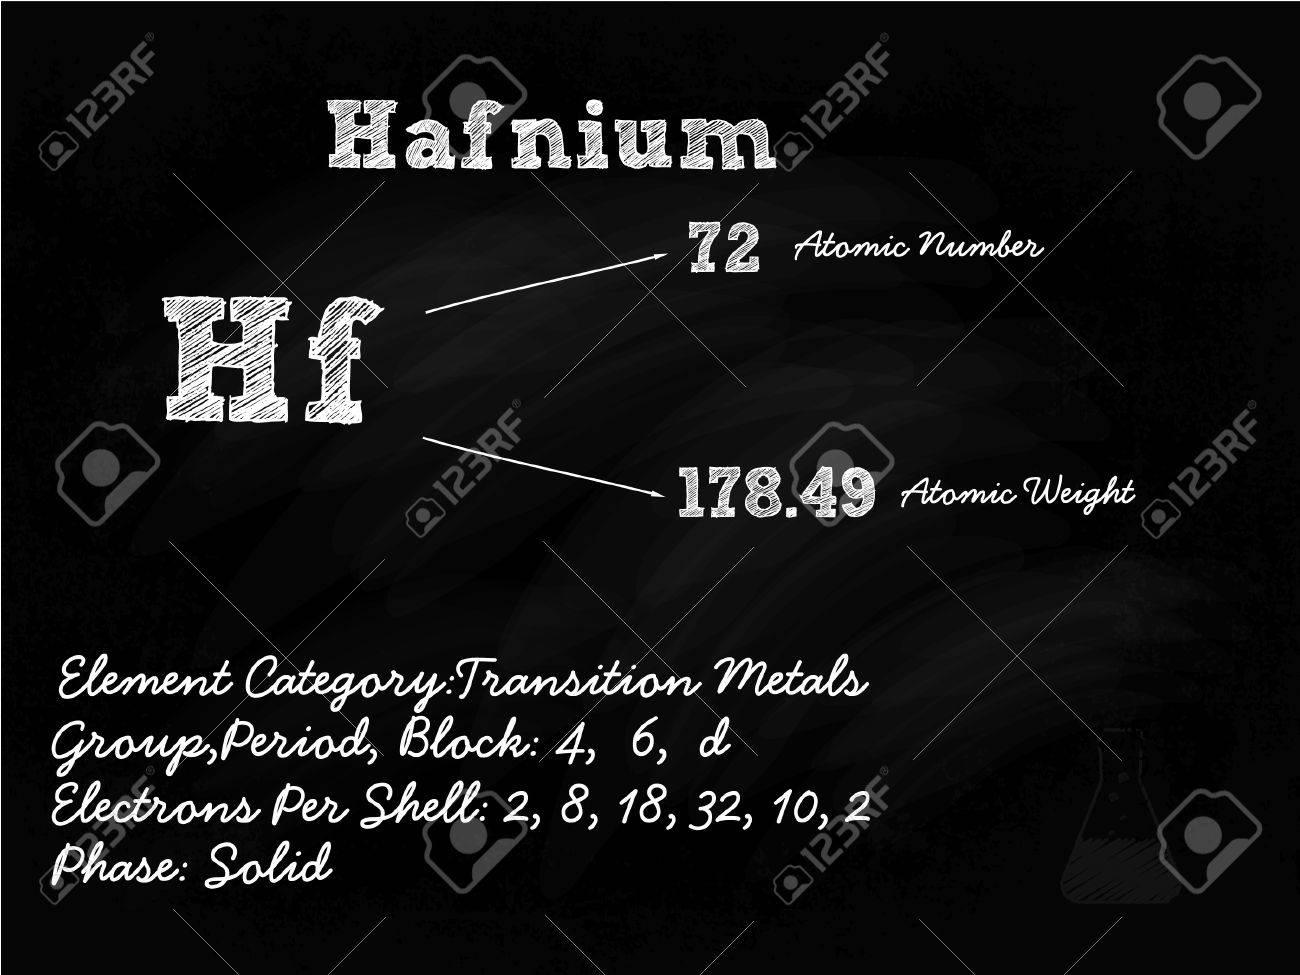 Hafnium Symbol Illustration On Blackboard With Chalk Stock Vector - 22171247